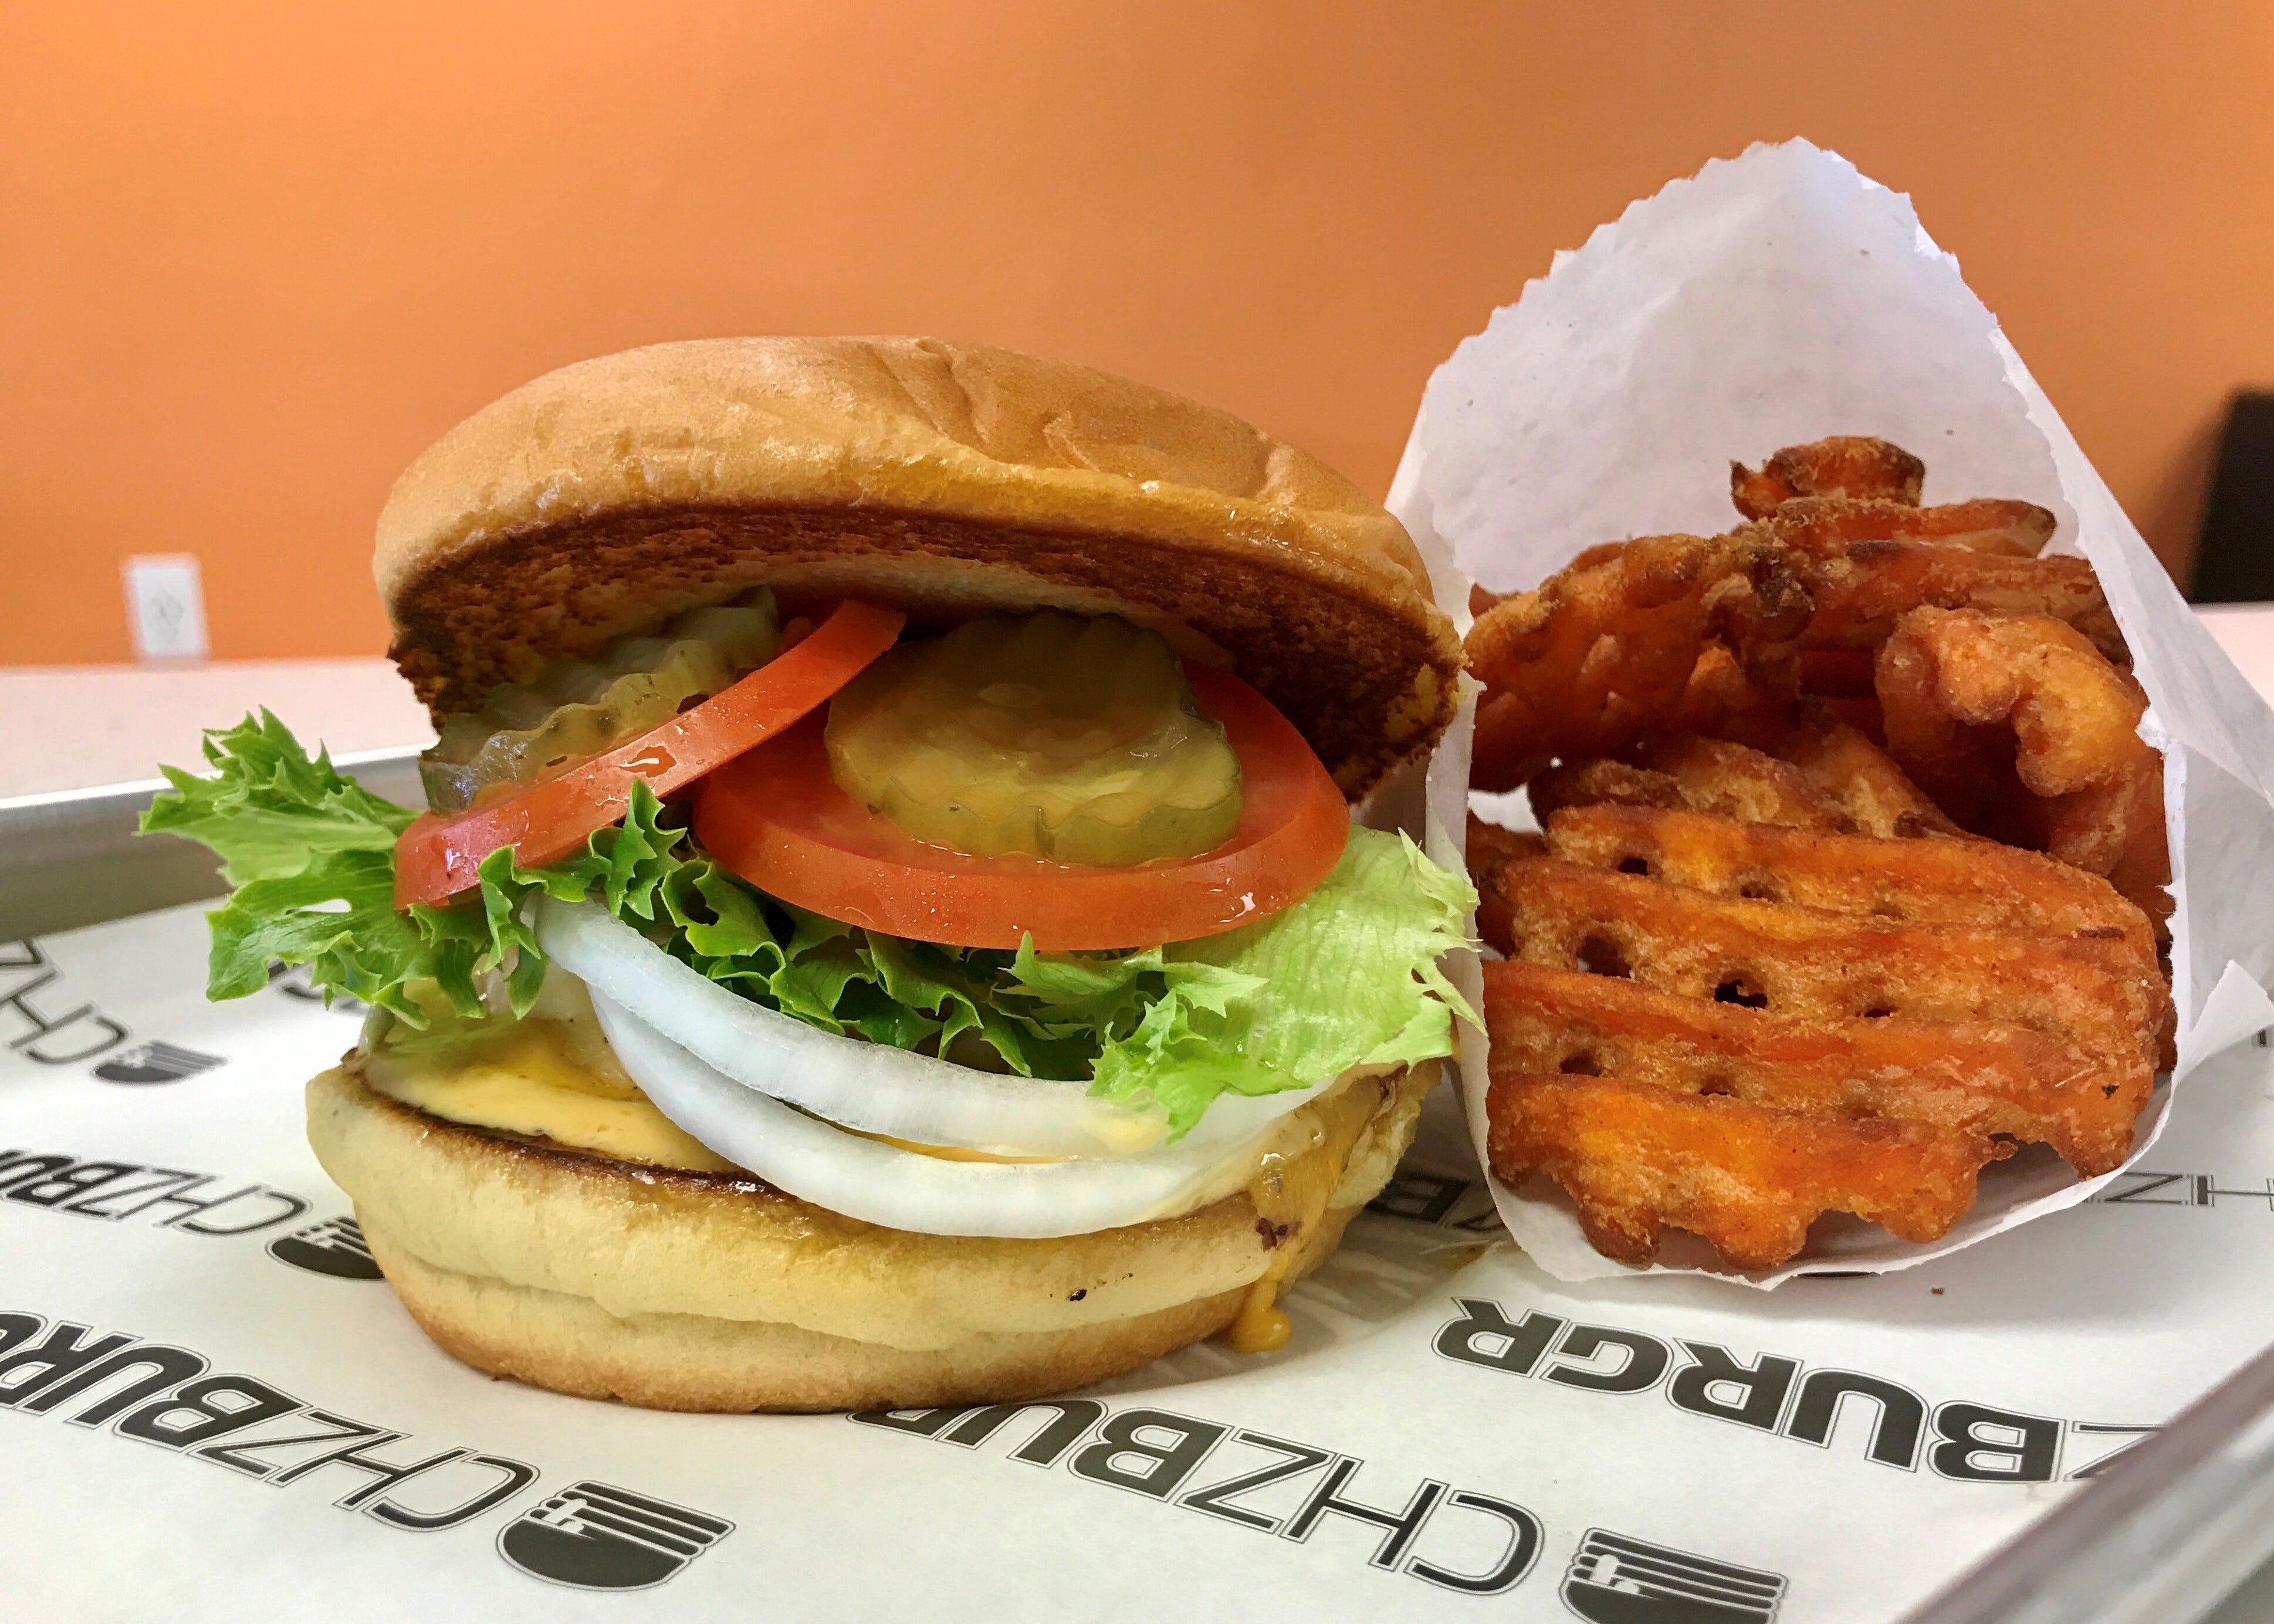 new glendale restaurant chzburgr now open, serving la style burgers